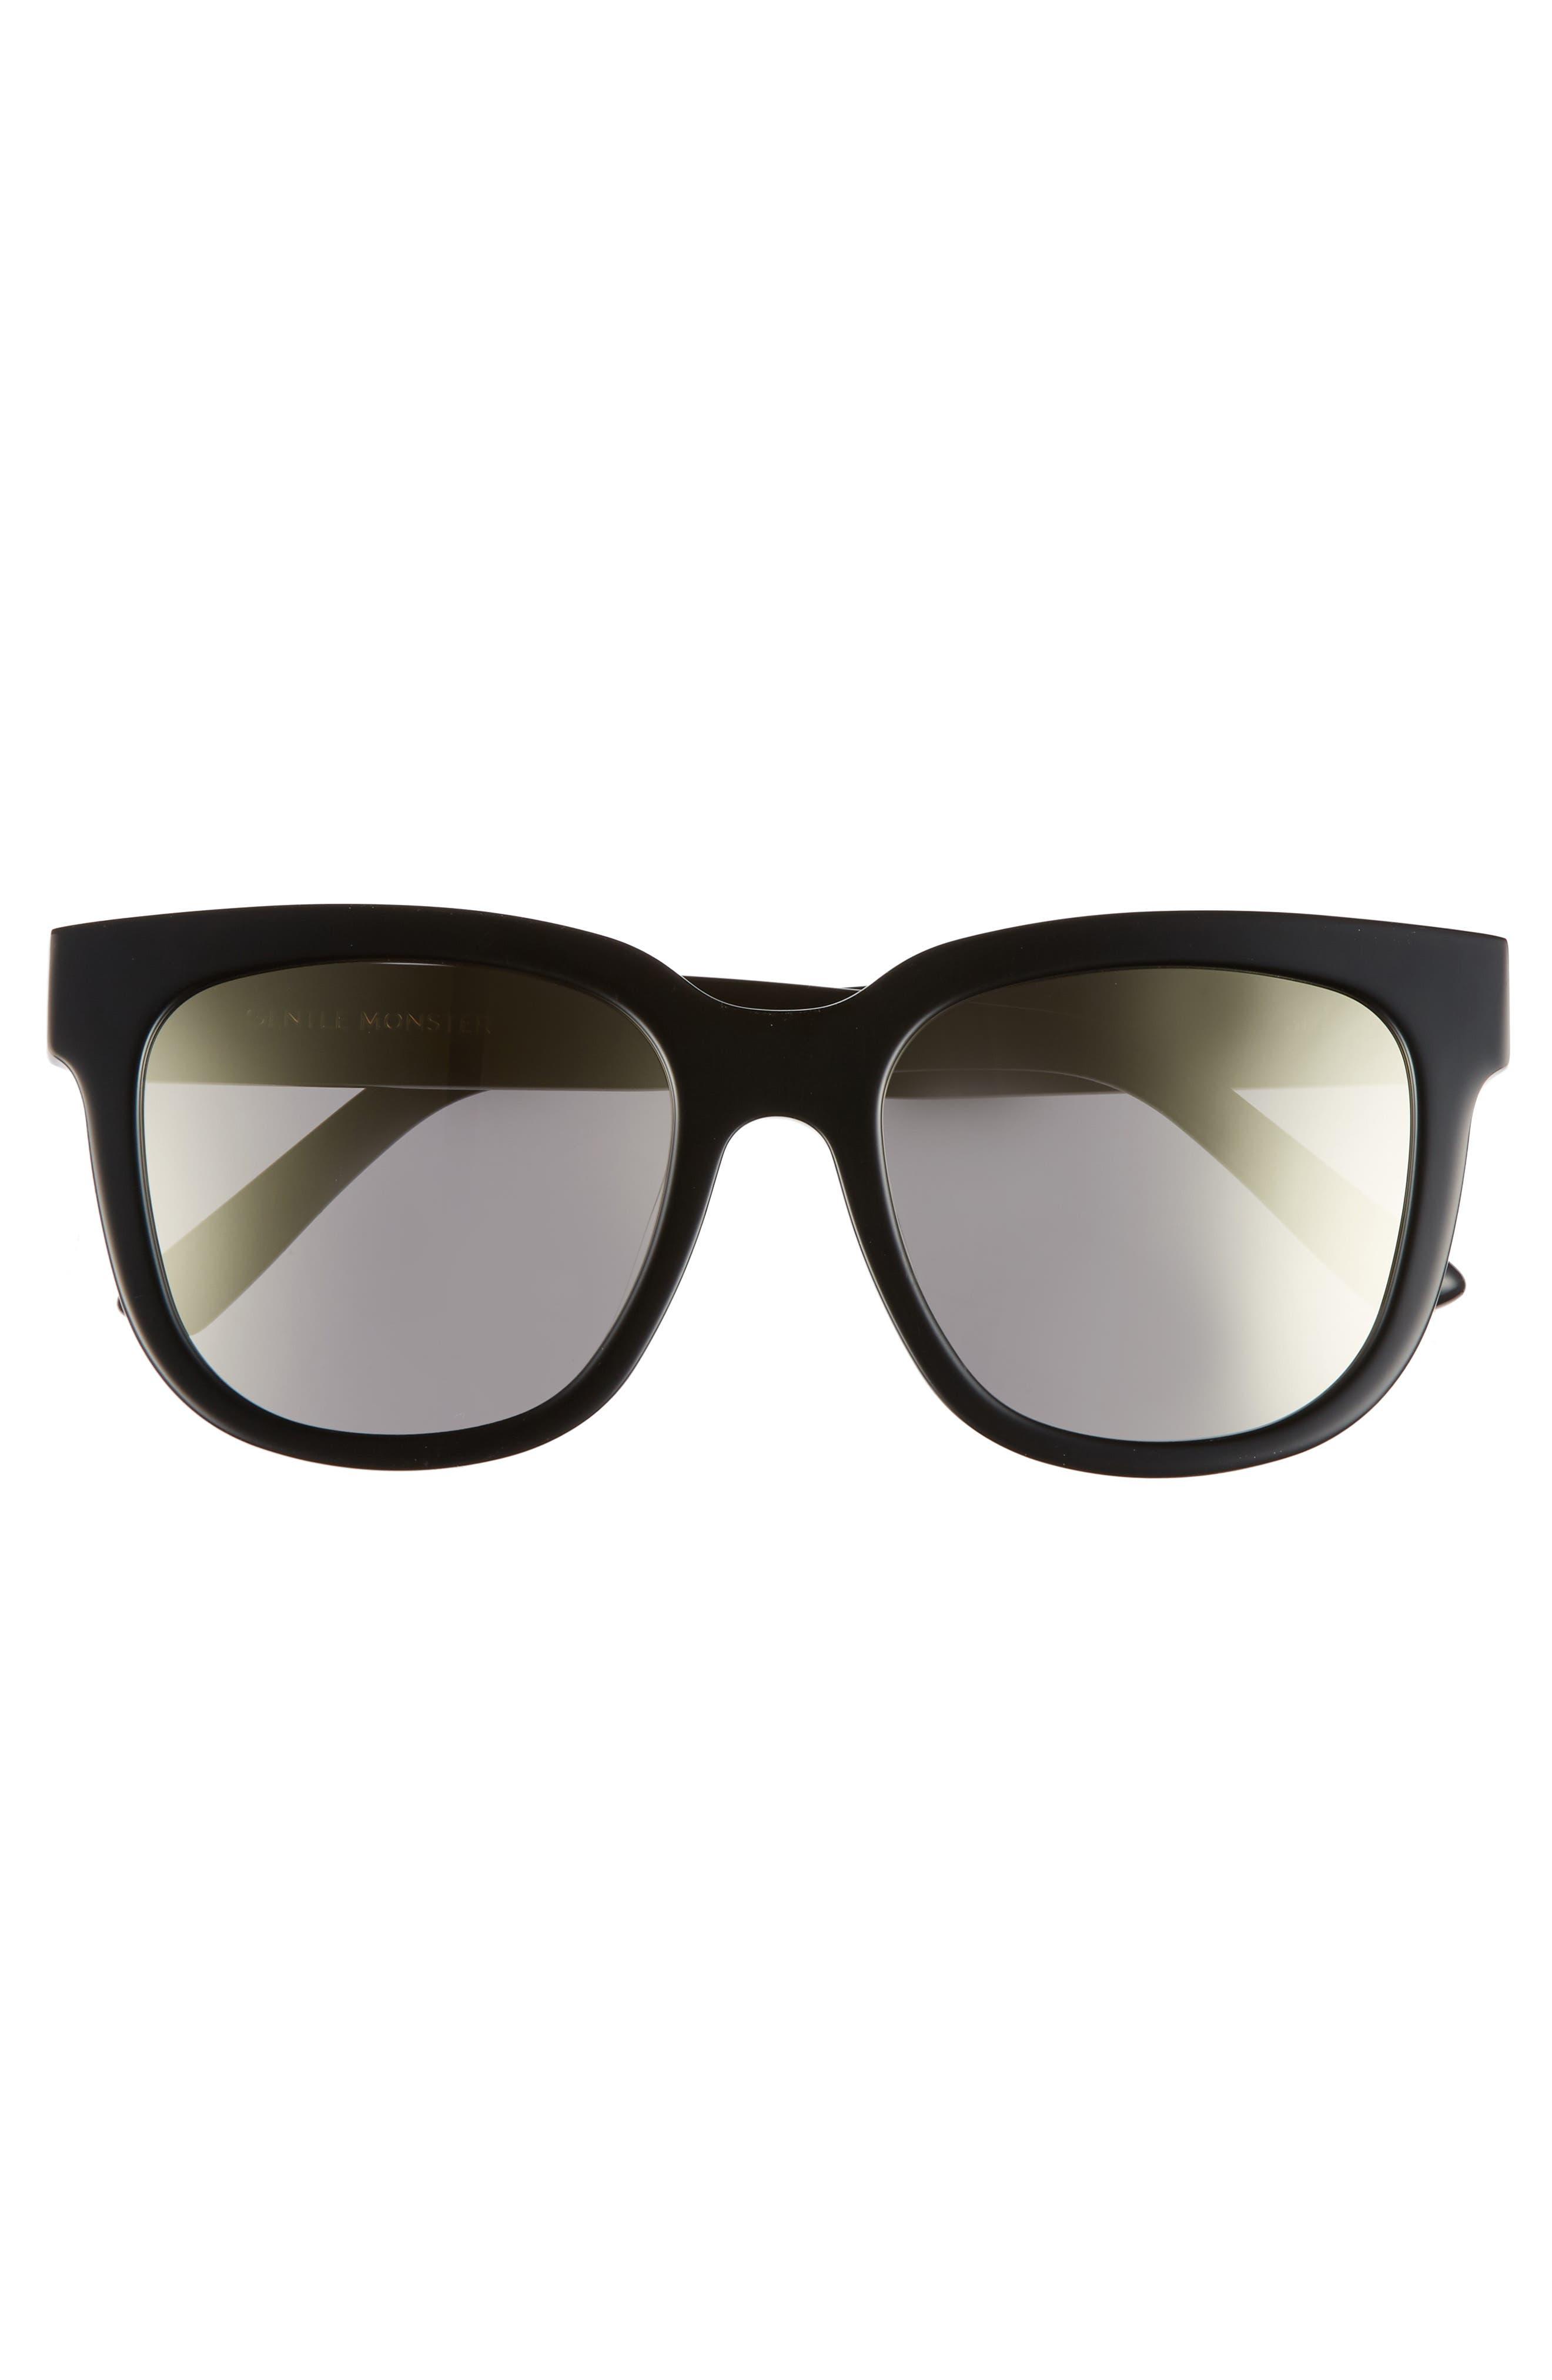 Salt 55mm Sunglasses,                             Alternate thumbnail 10, color,